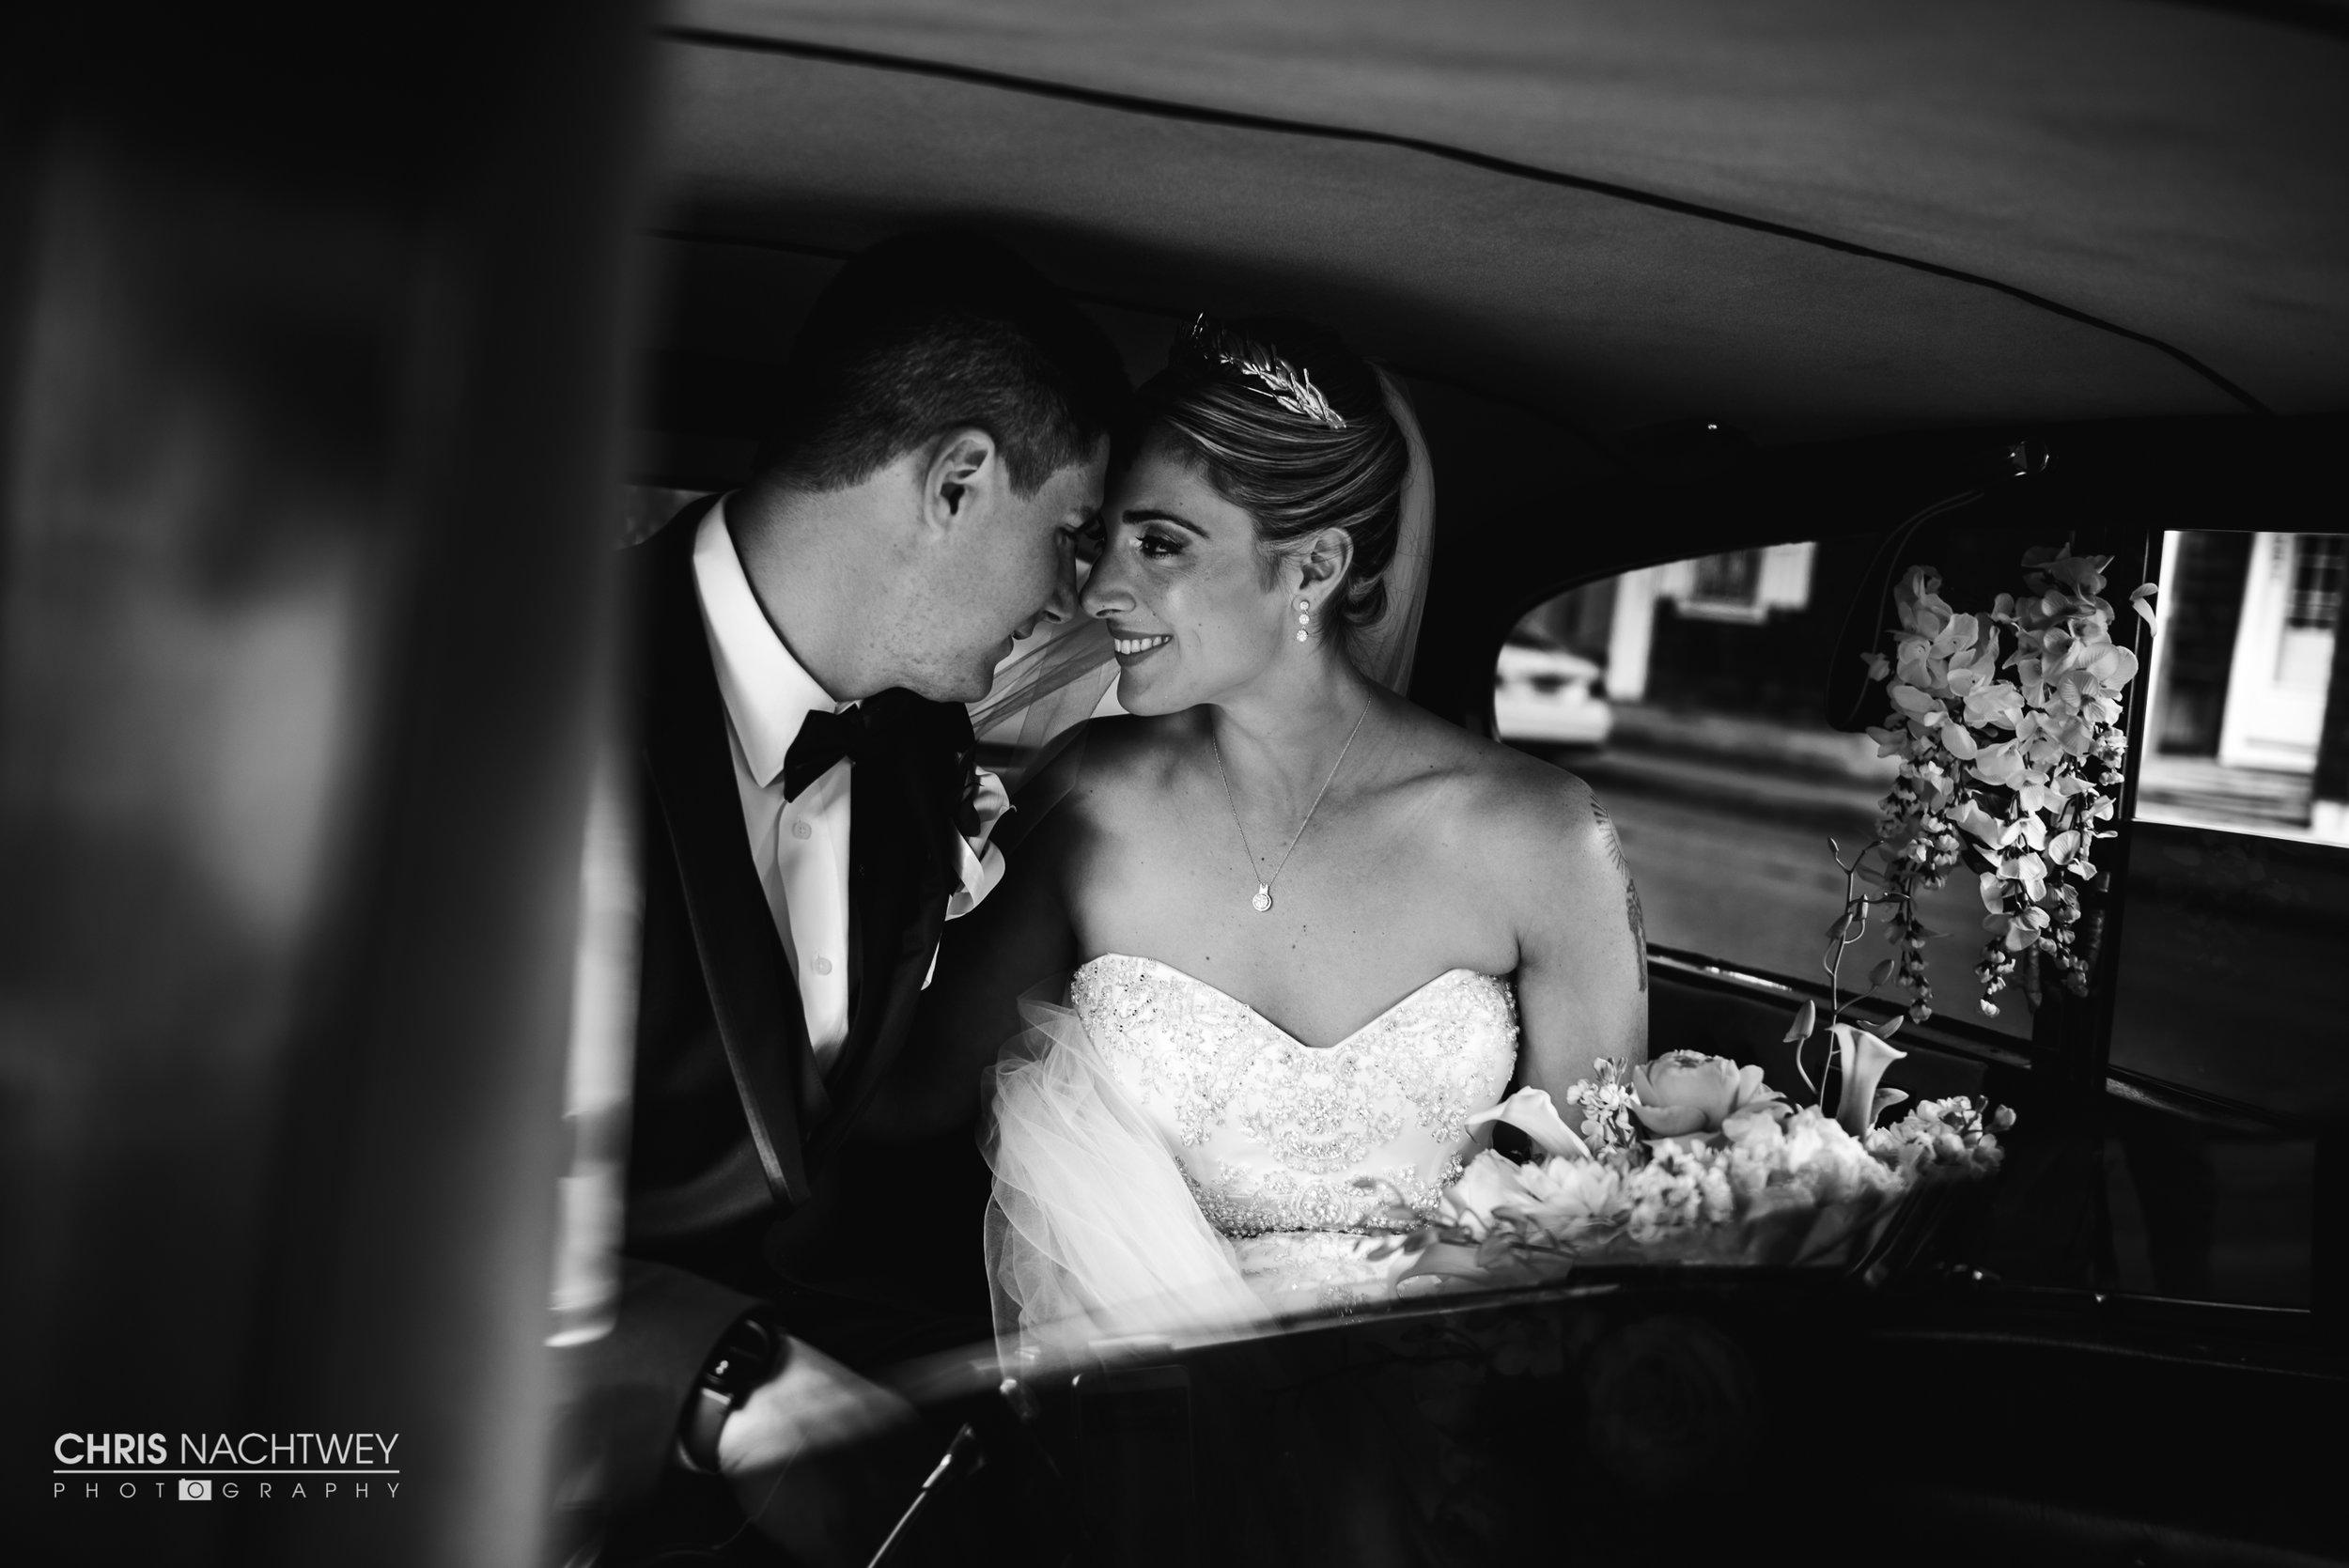 mystic-ct-artistic-wedding-photographer-chris-nachtwey-2017-1.jpg